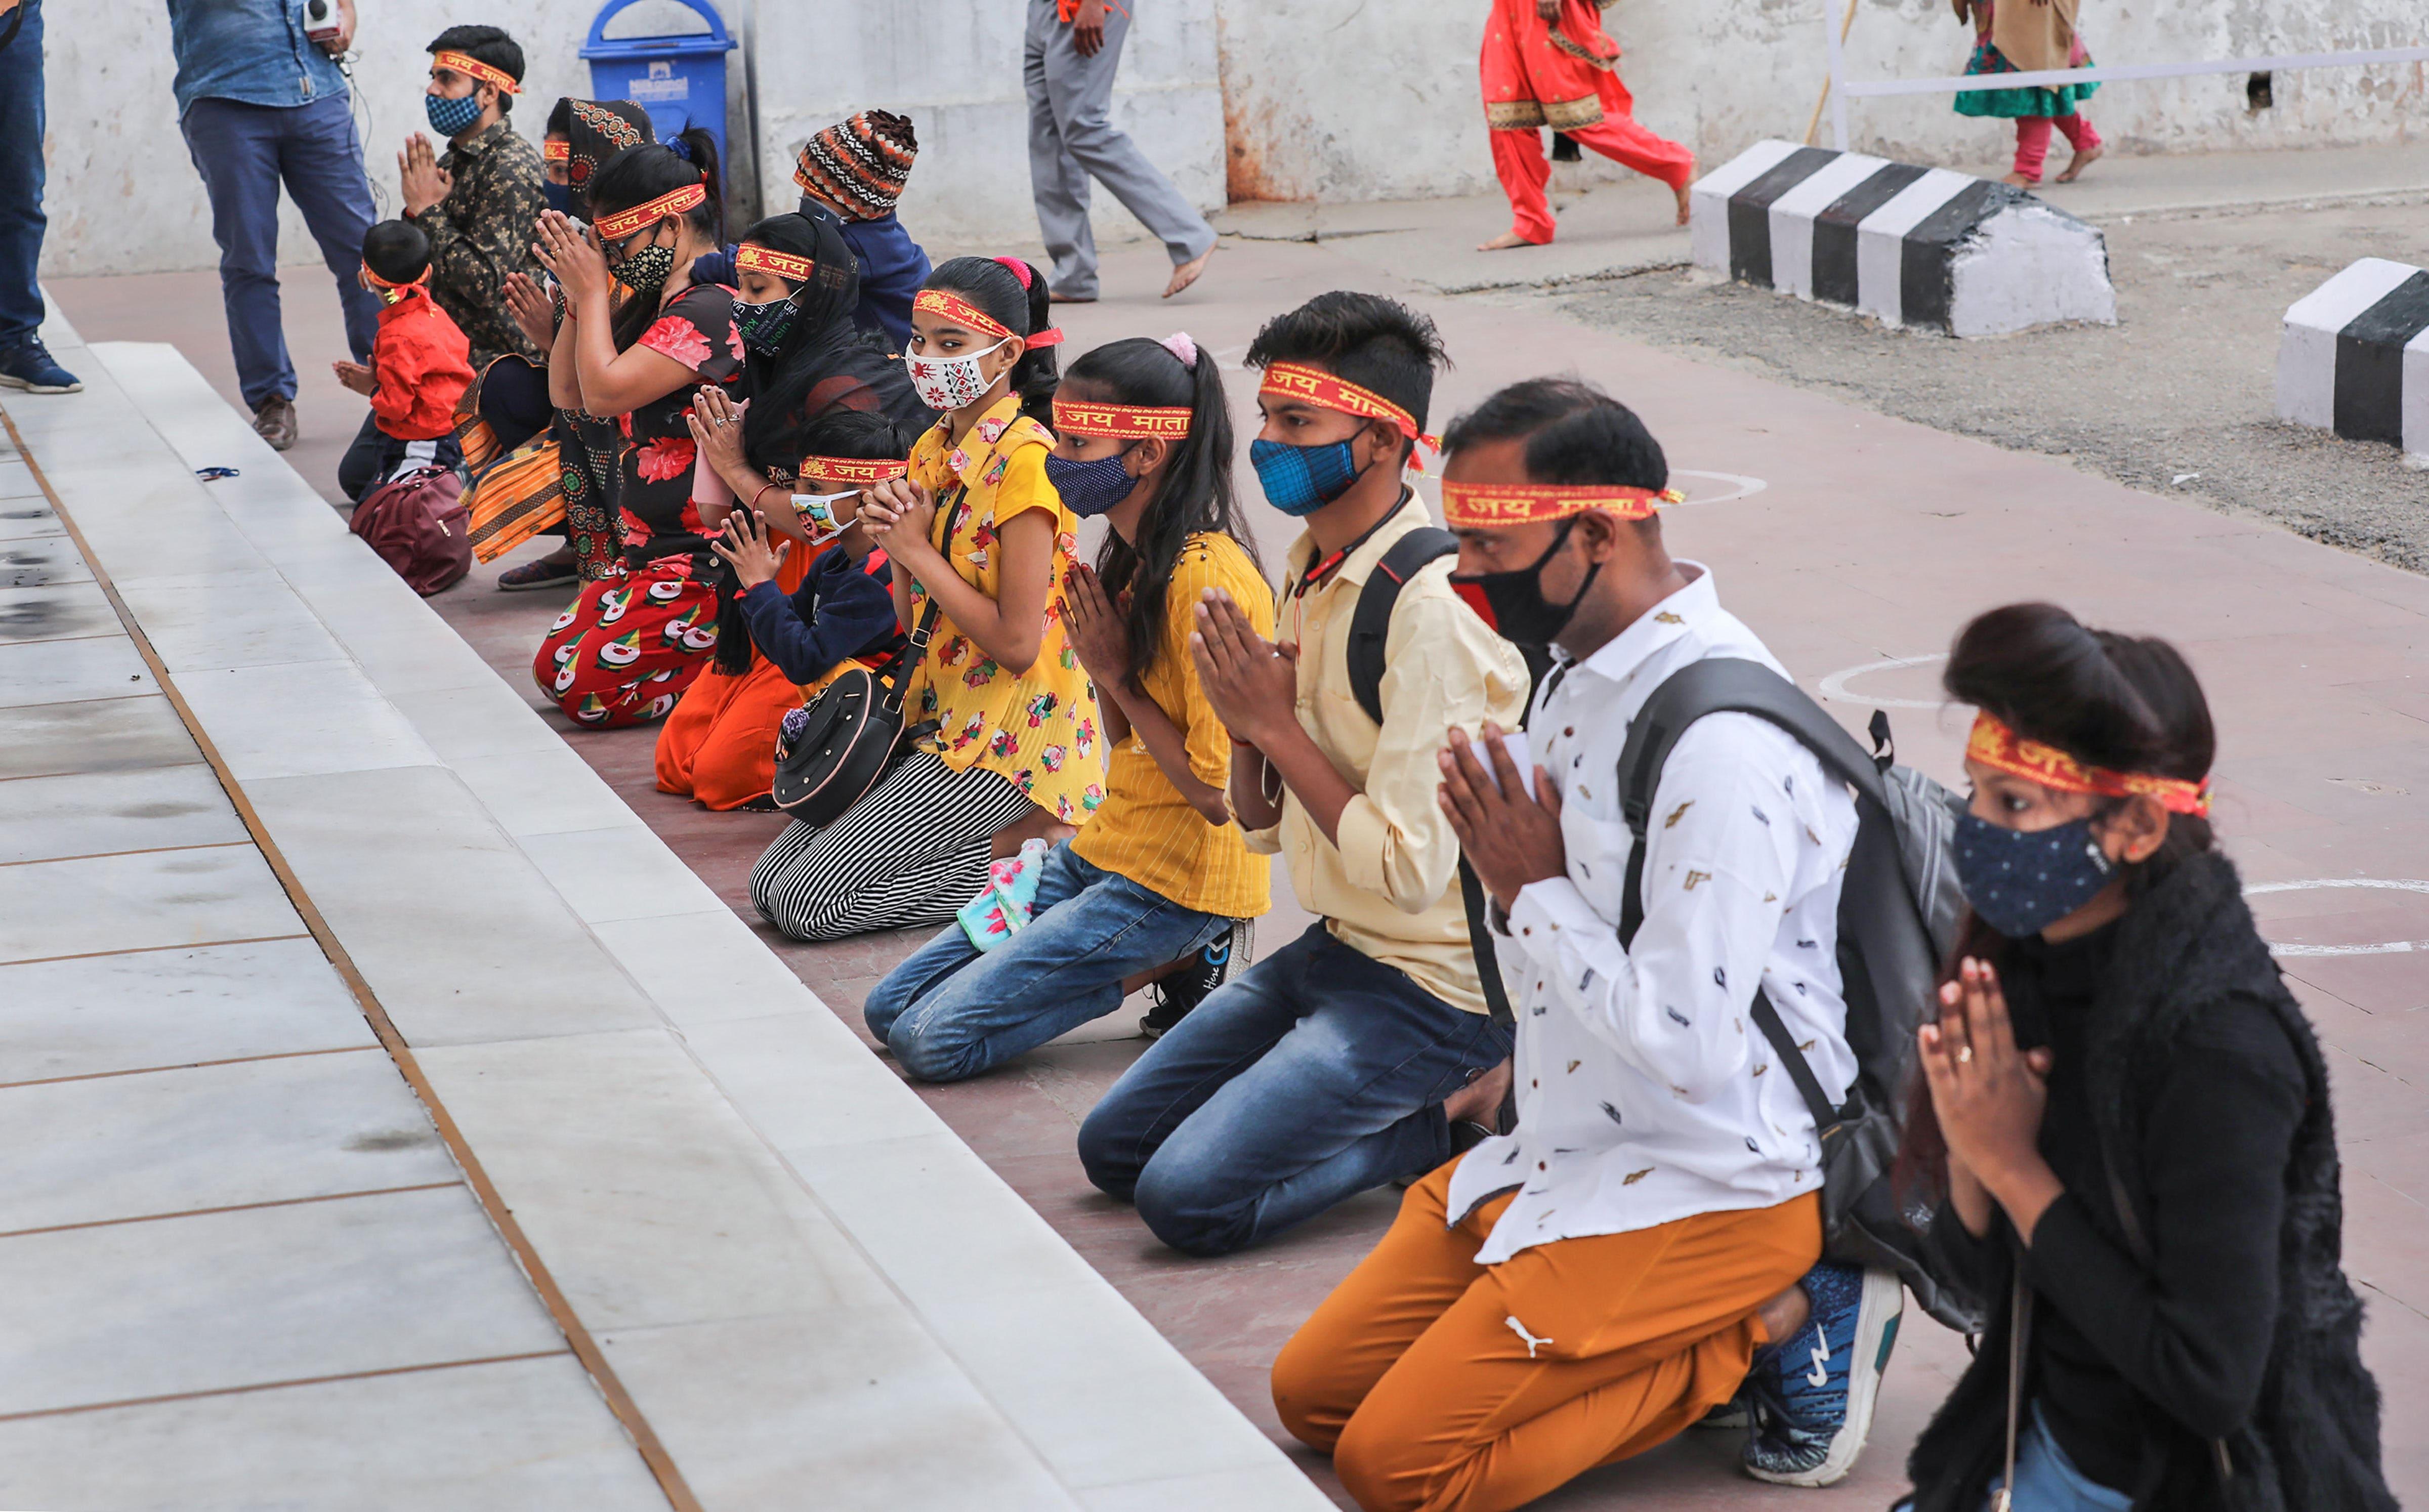 Devotees on their way to Mata Vaishno Devi Temple, Jammu